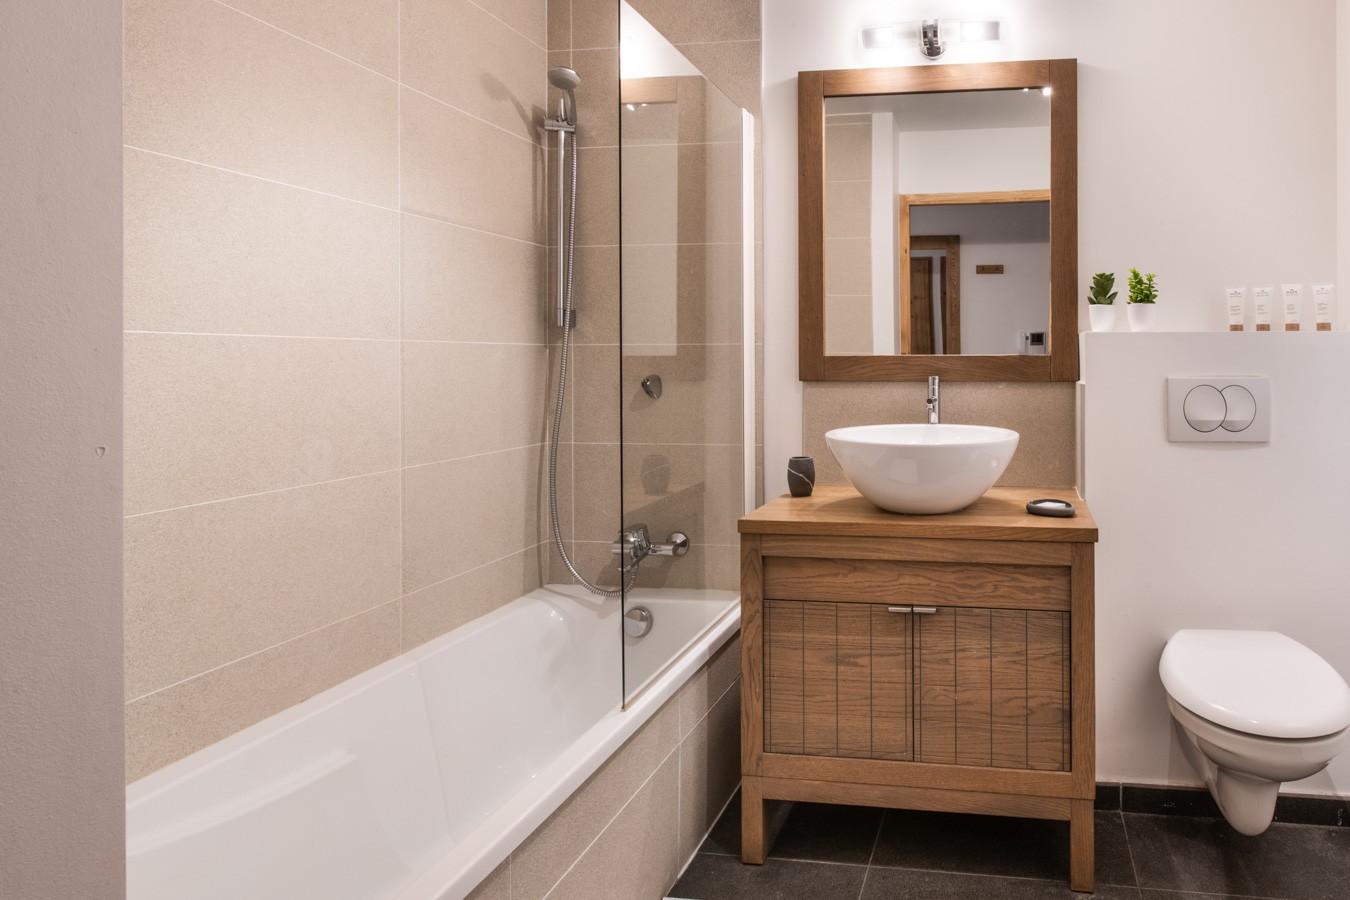 Les Gets Luxury Rental Appartment Anrelle Bathroom 2